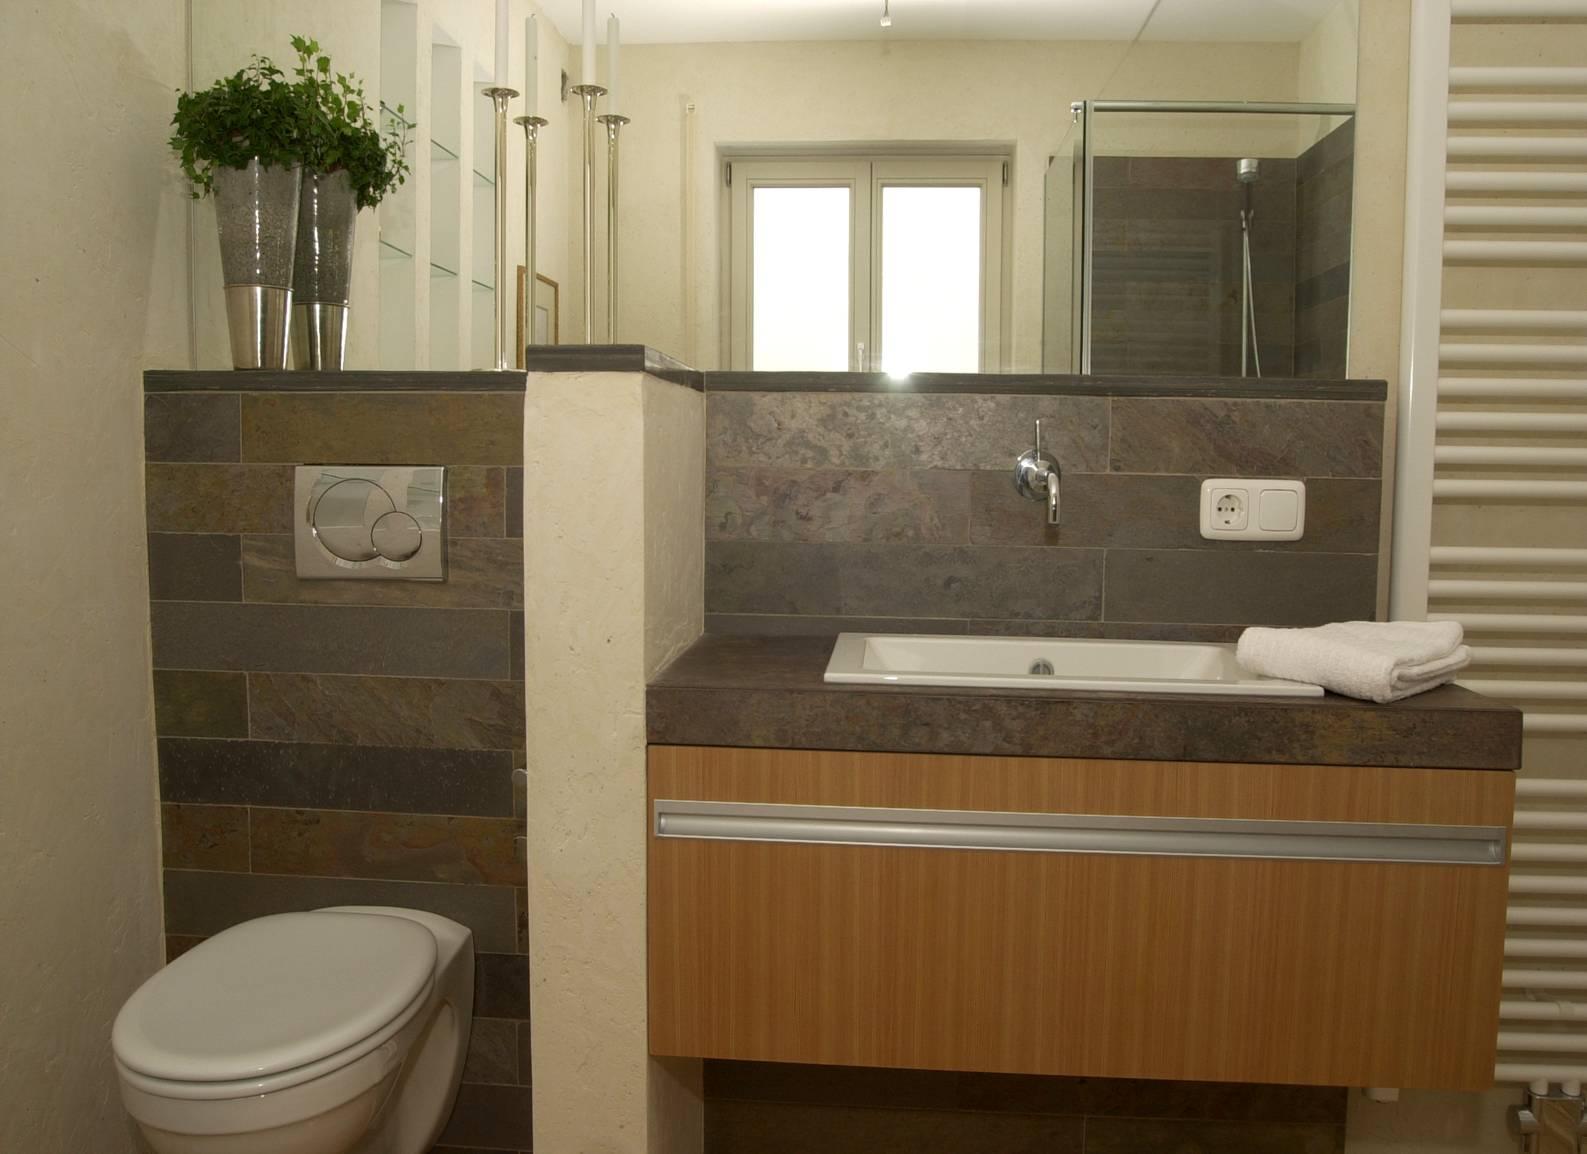 badezimmer fliesen reinigen haus design ideen. Black Bedroom Furniture Sets. Home Design Ideas